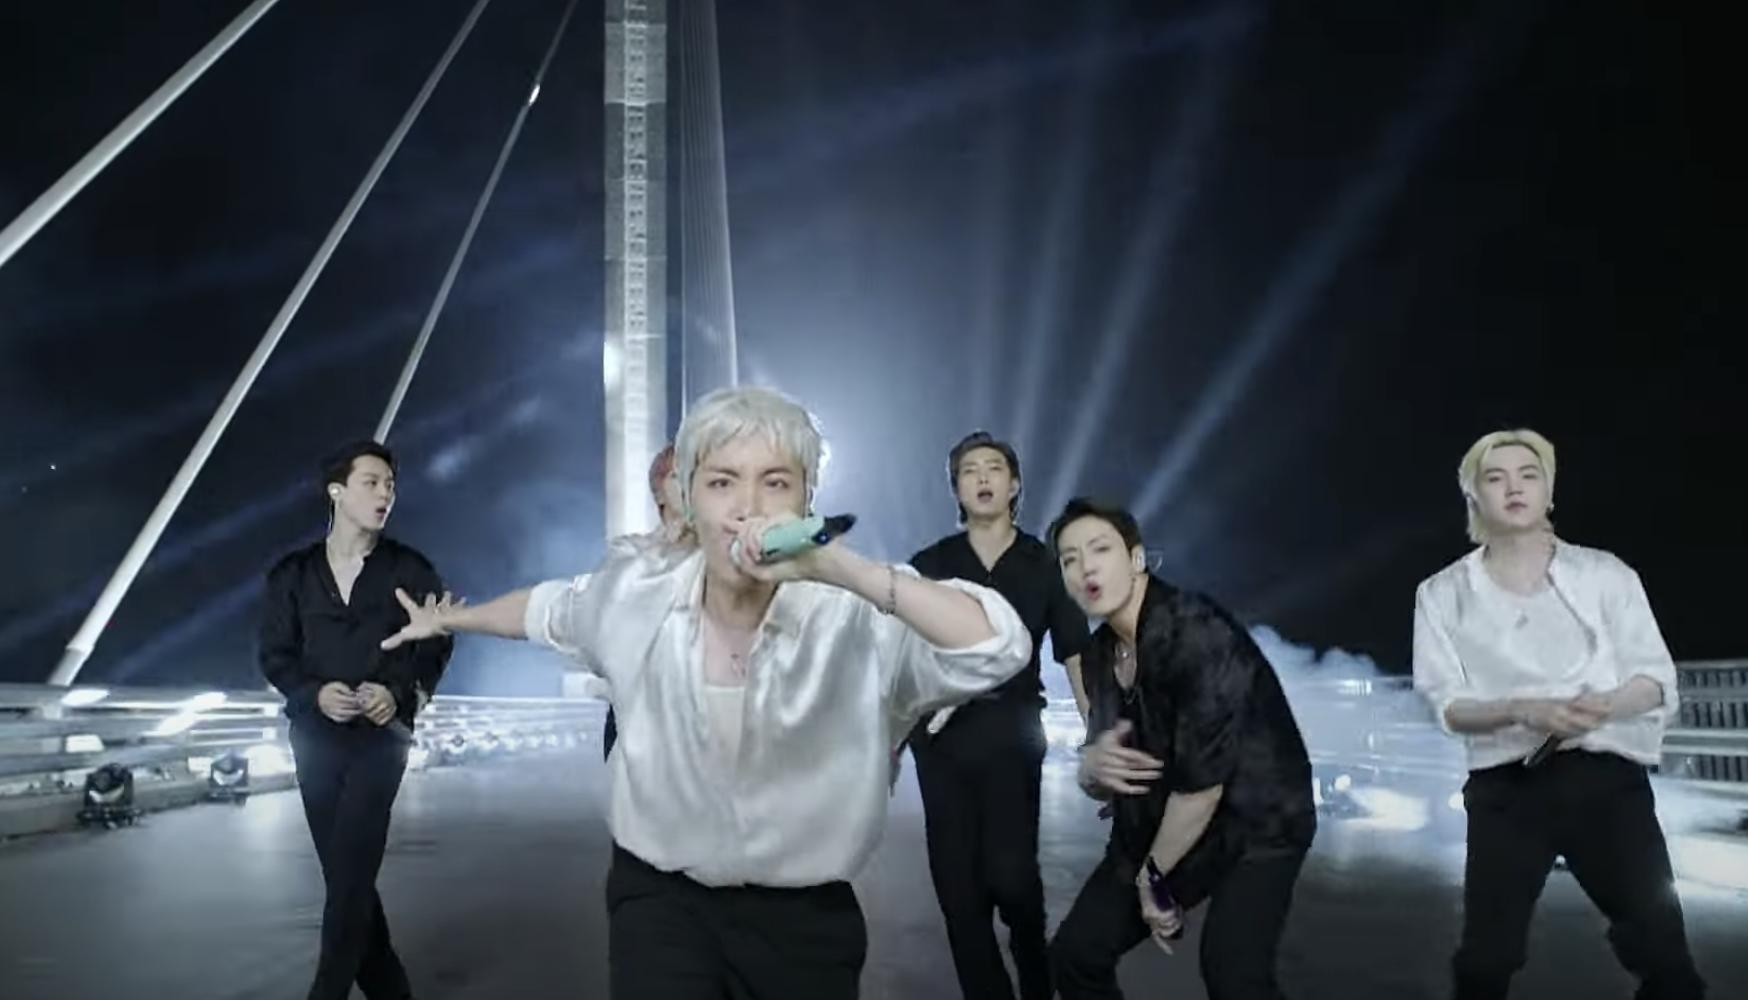 Watch BTS Perform Hit Single 'Butter' From a Bridge on 'Fallon'